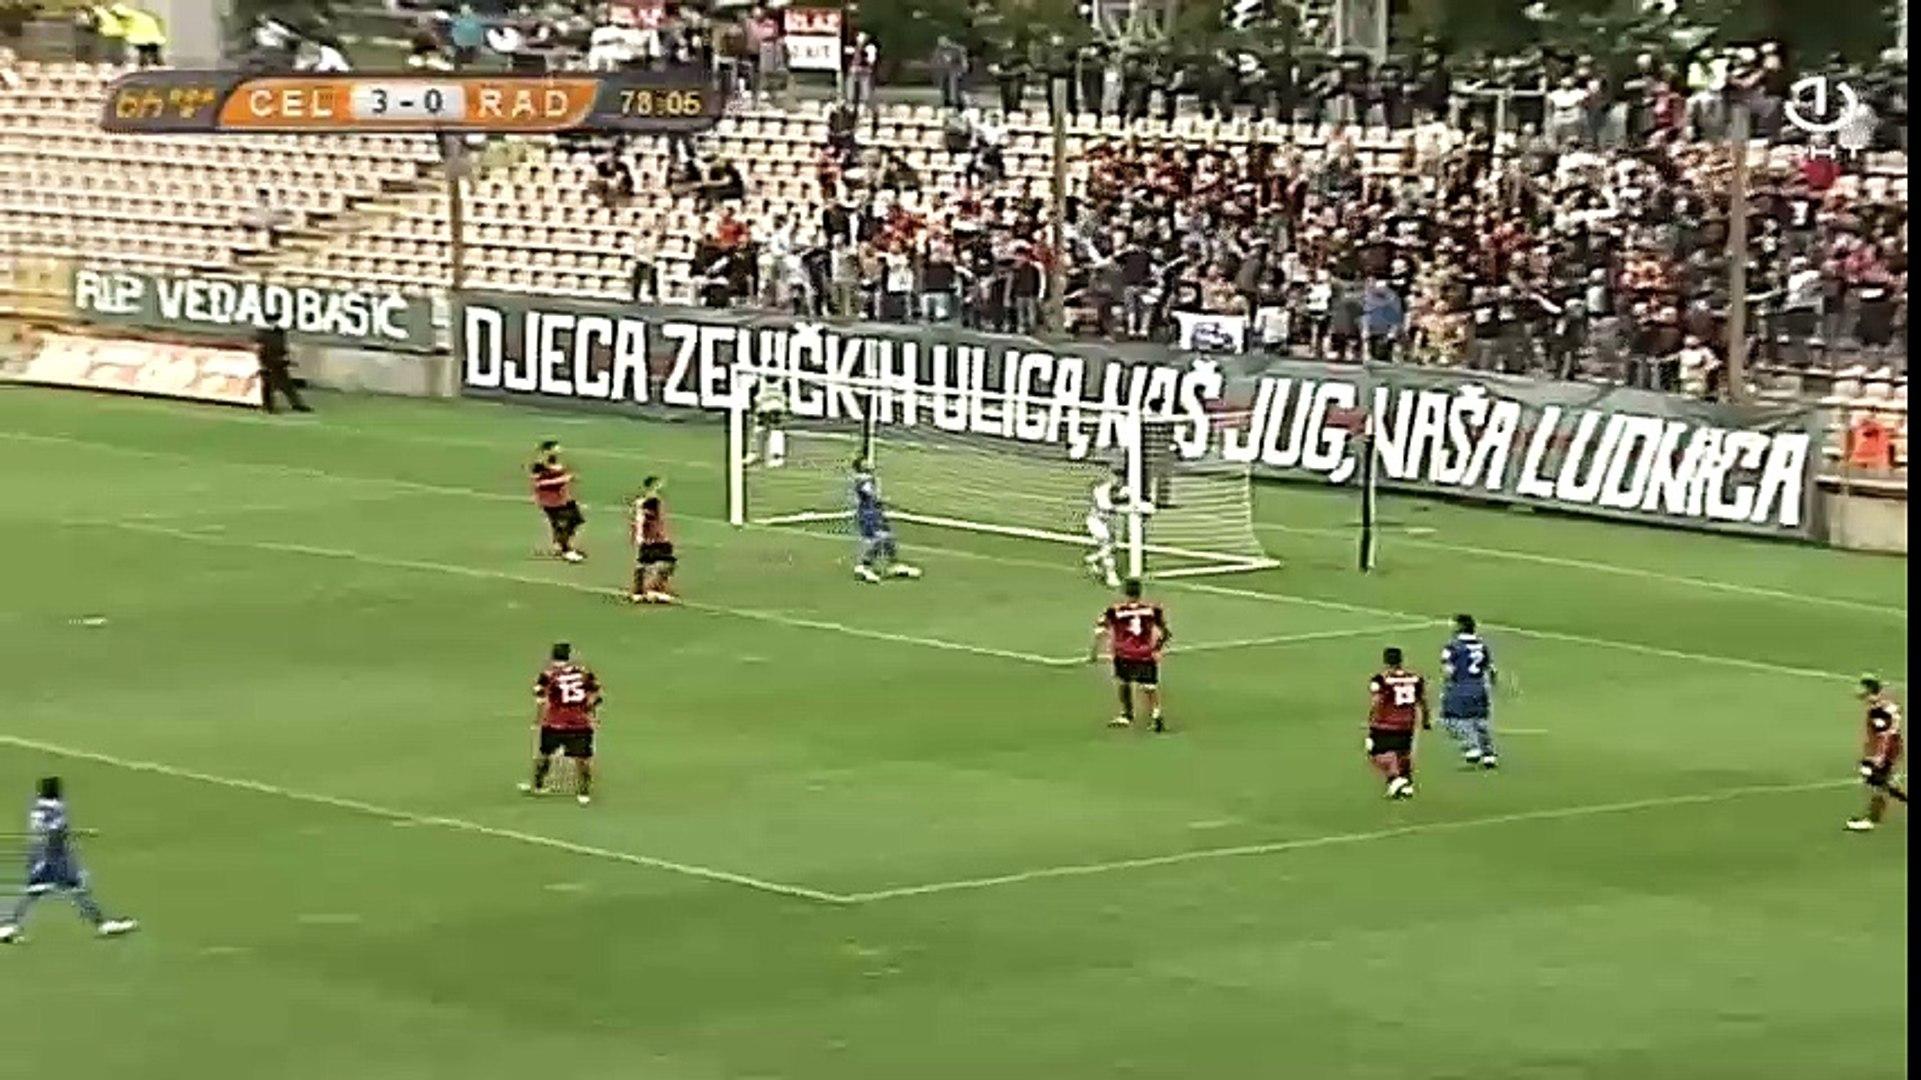 NK Čelik - FK Radnik B. / Robijaši oduševljeni igrom